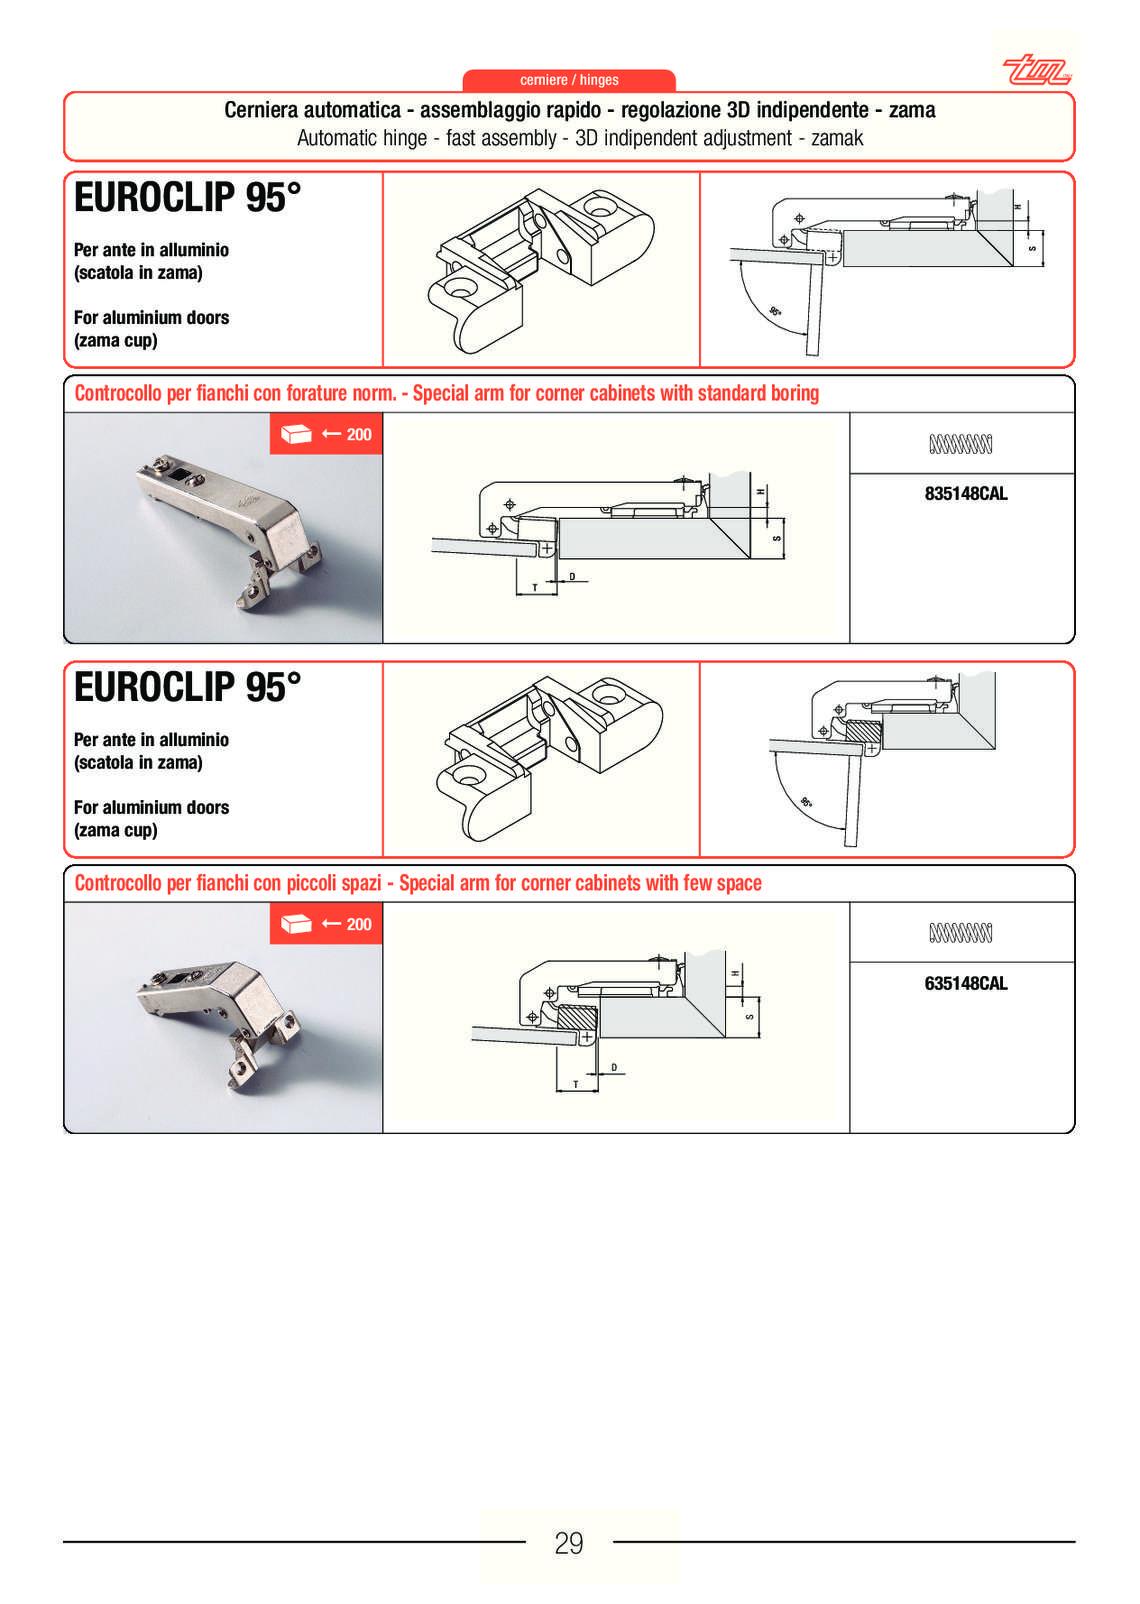 euro-hinges-catalogue_175_028.jpg